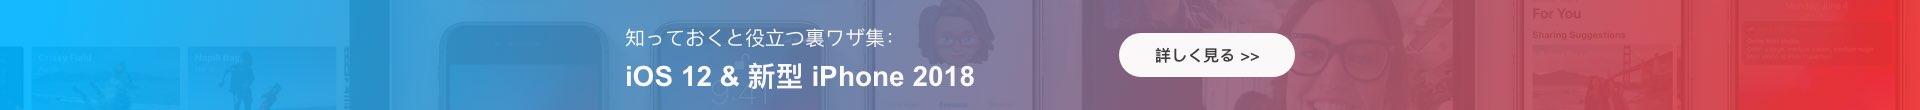 iOS 12 & New iPhone 2018